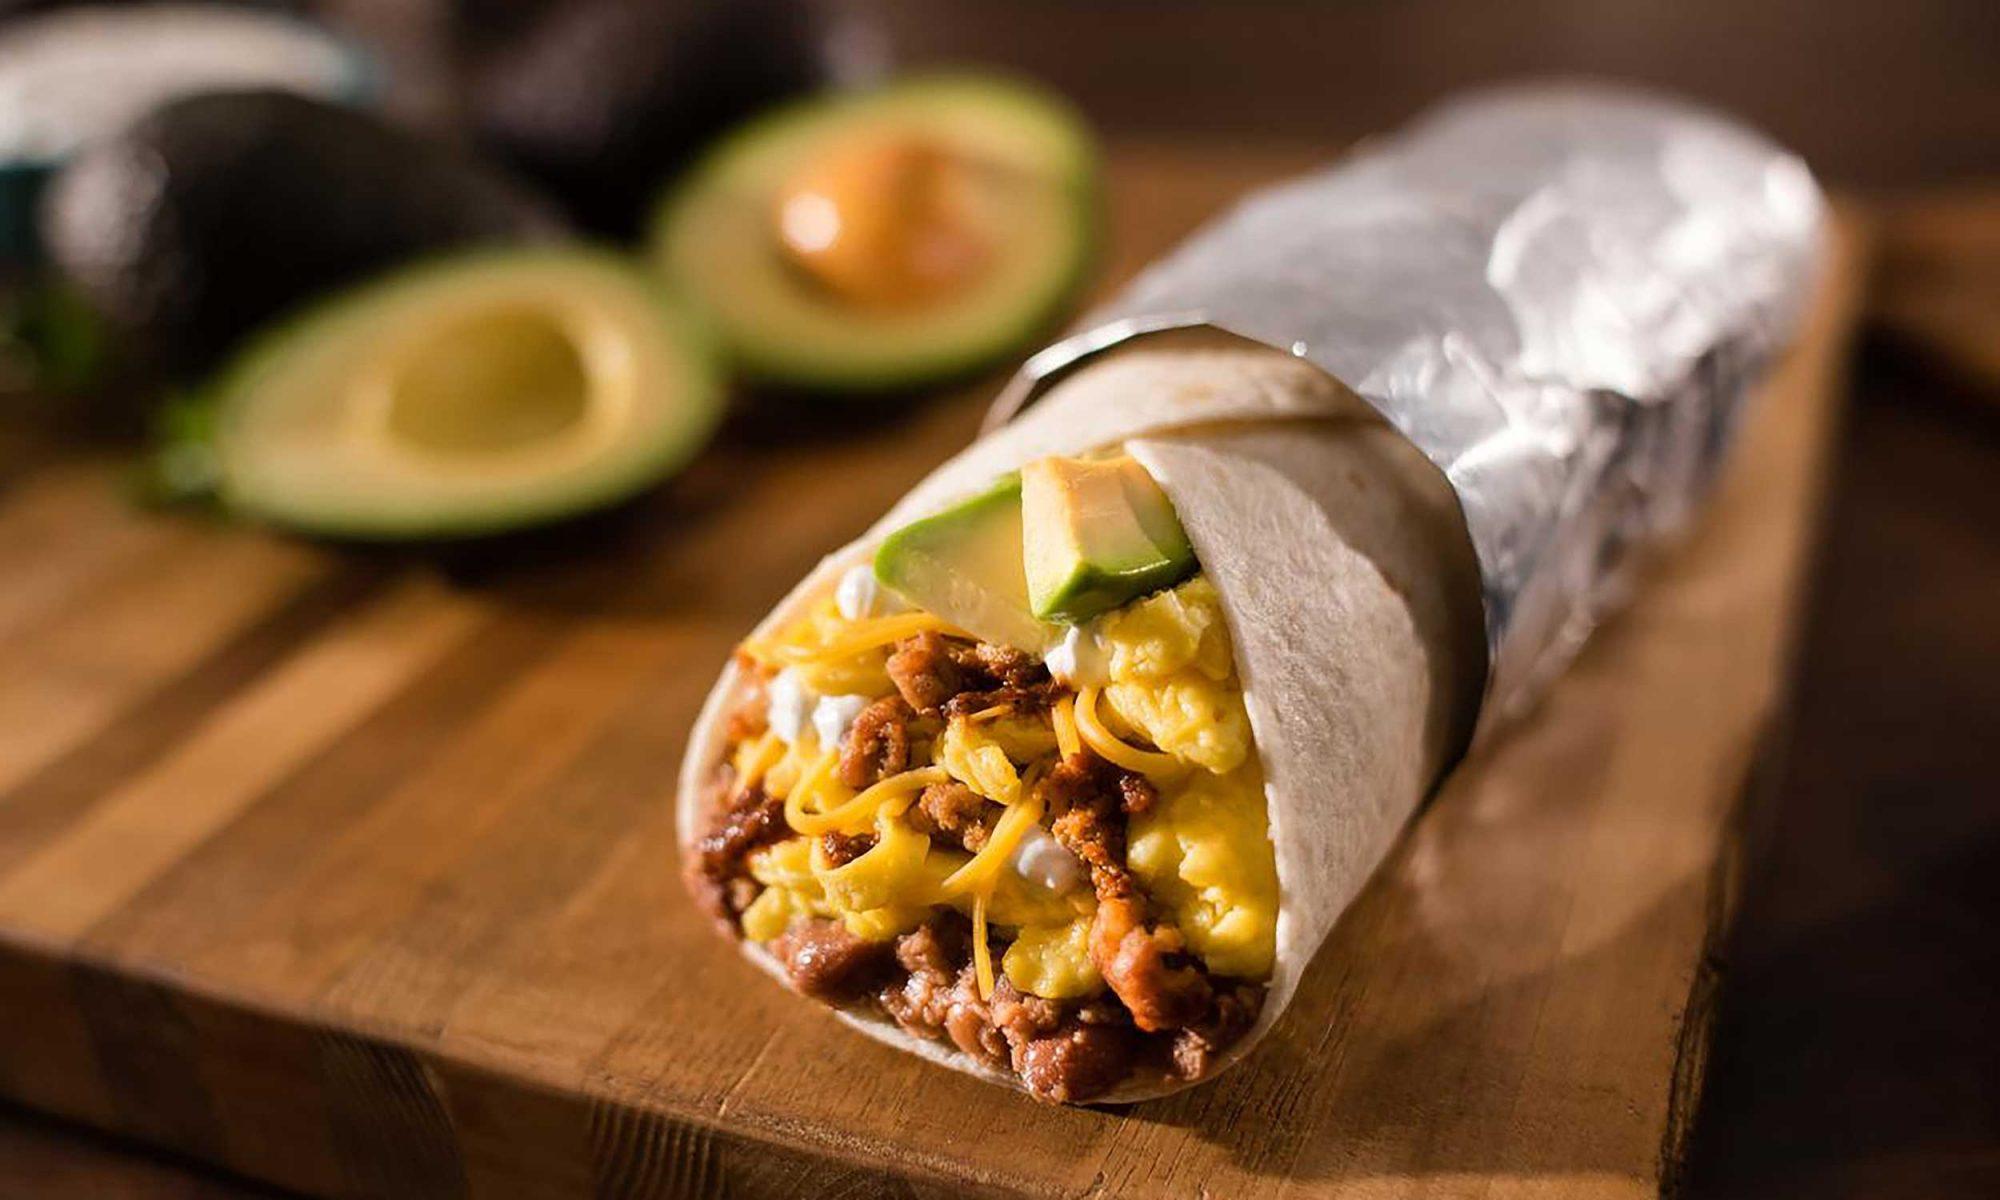 EC: Del Taco's New One-Pound Breakfast Burrito Only Costs $4.99